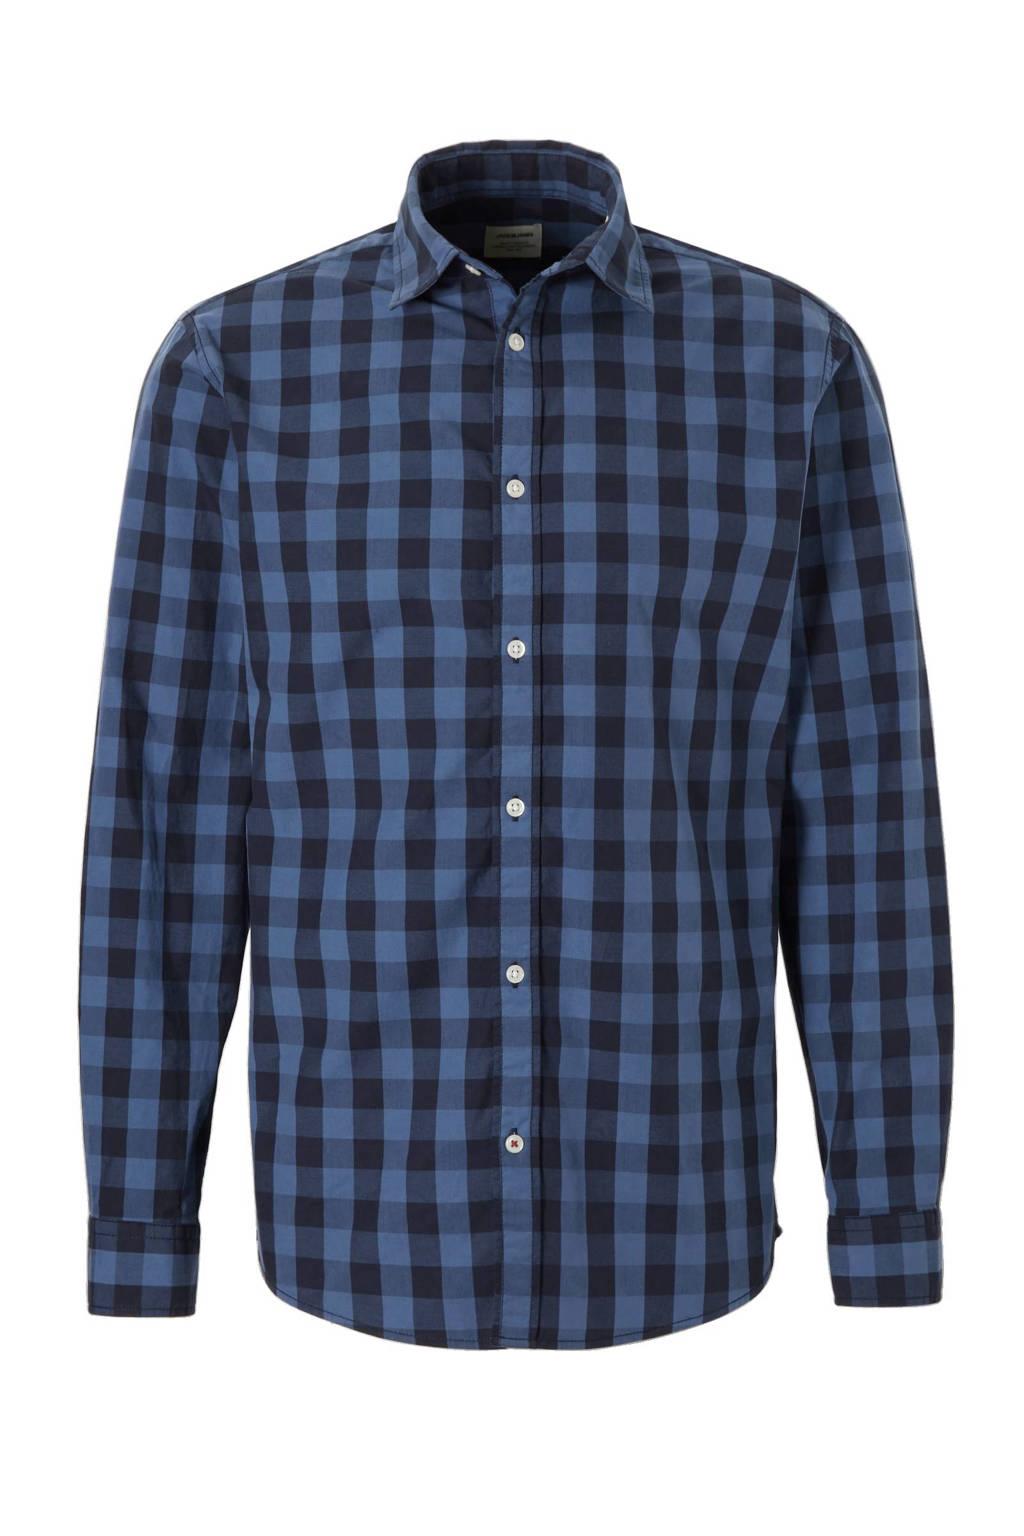 Jack & Jones Essentials Gingham regular fit overhemd, Marine/zwart